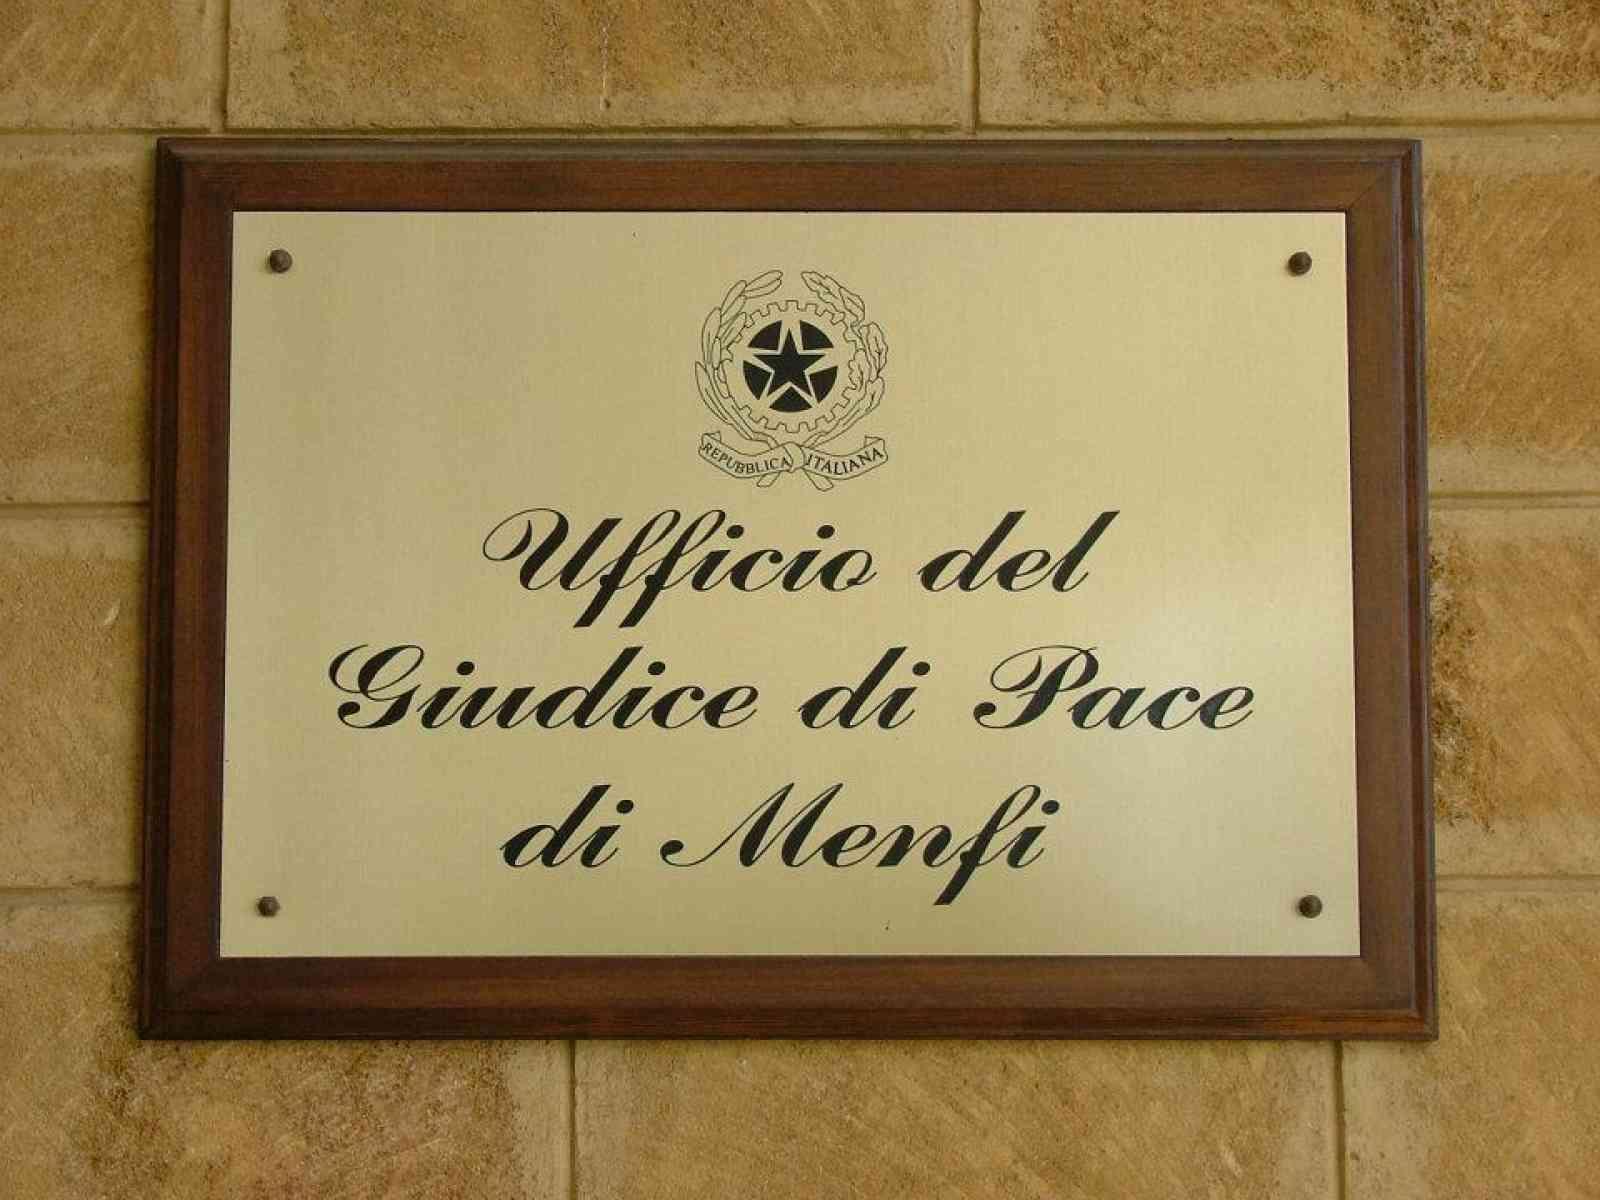 Giudice di pace di Menfi a rischio per mancanza di personale